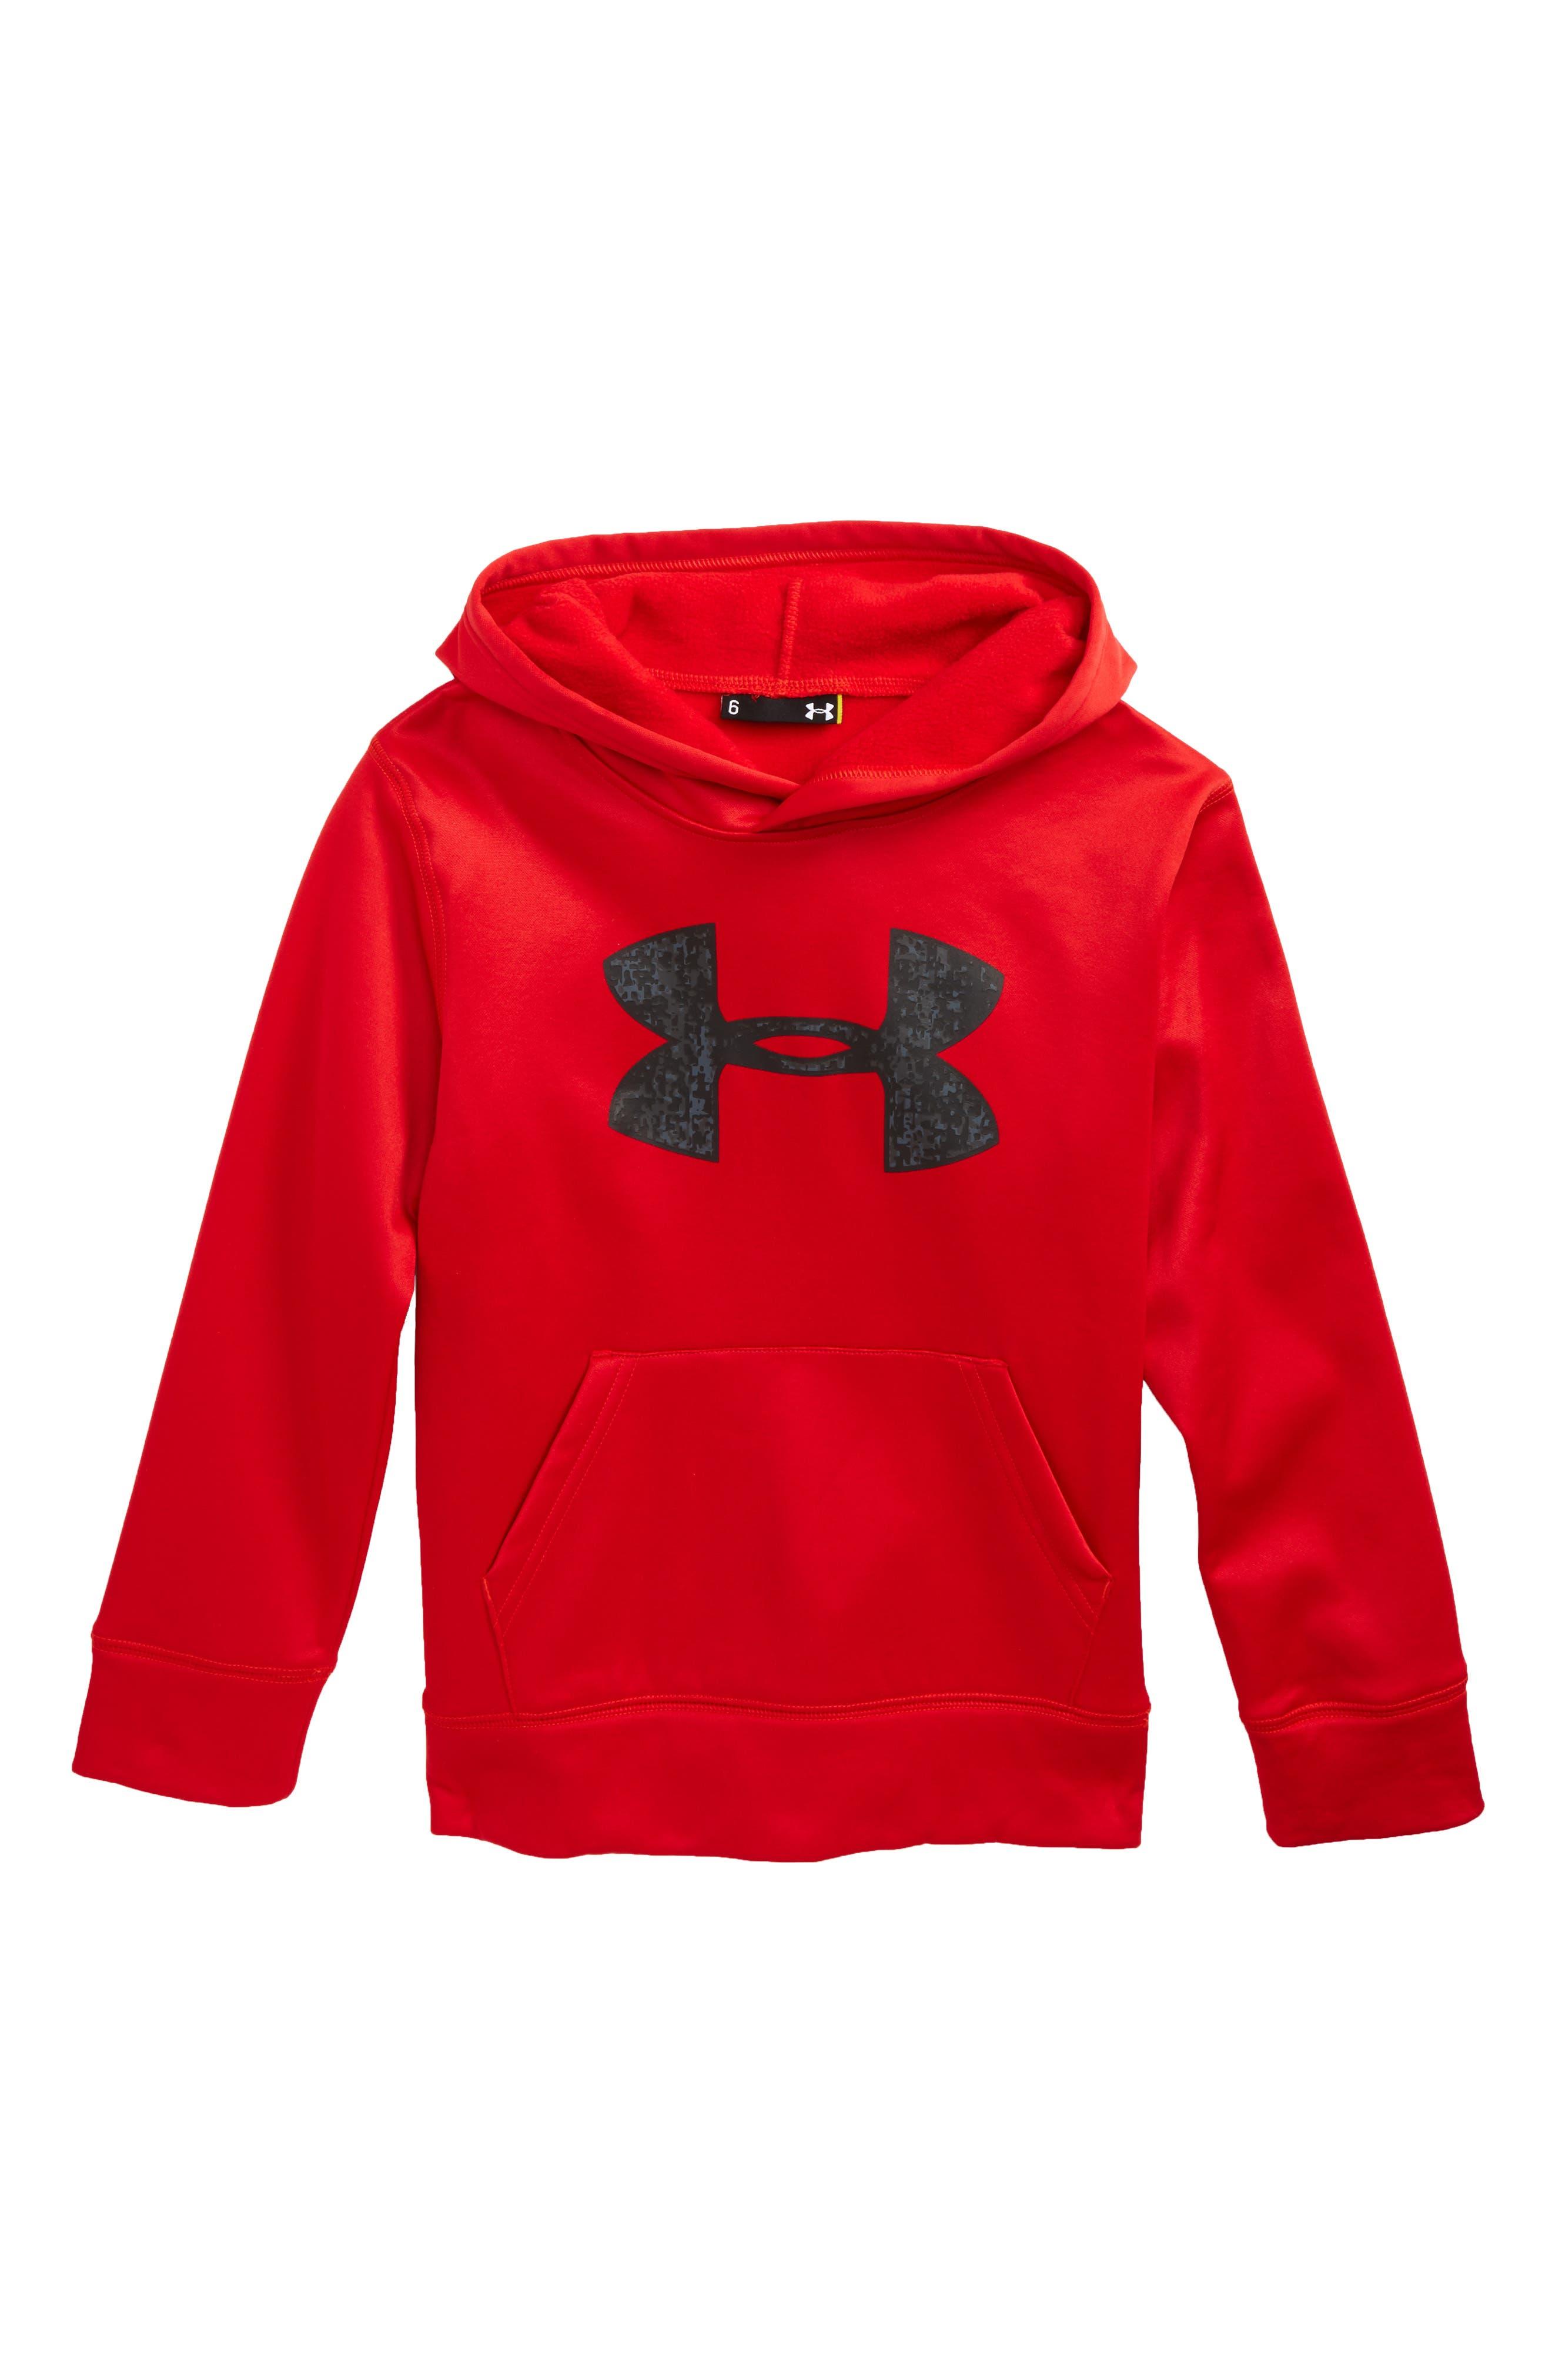 Main Image - Under Armour Digital City Logo Pullover Hoodie (Little Boys)